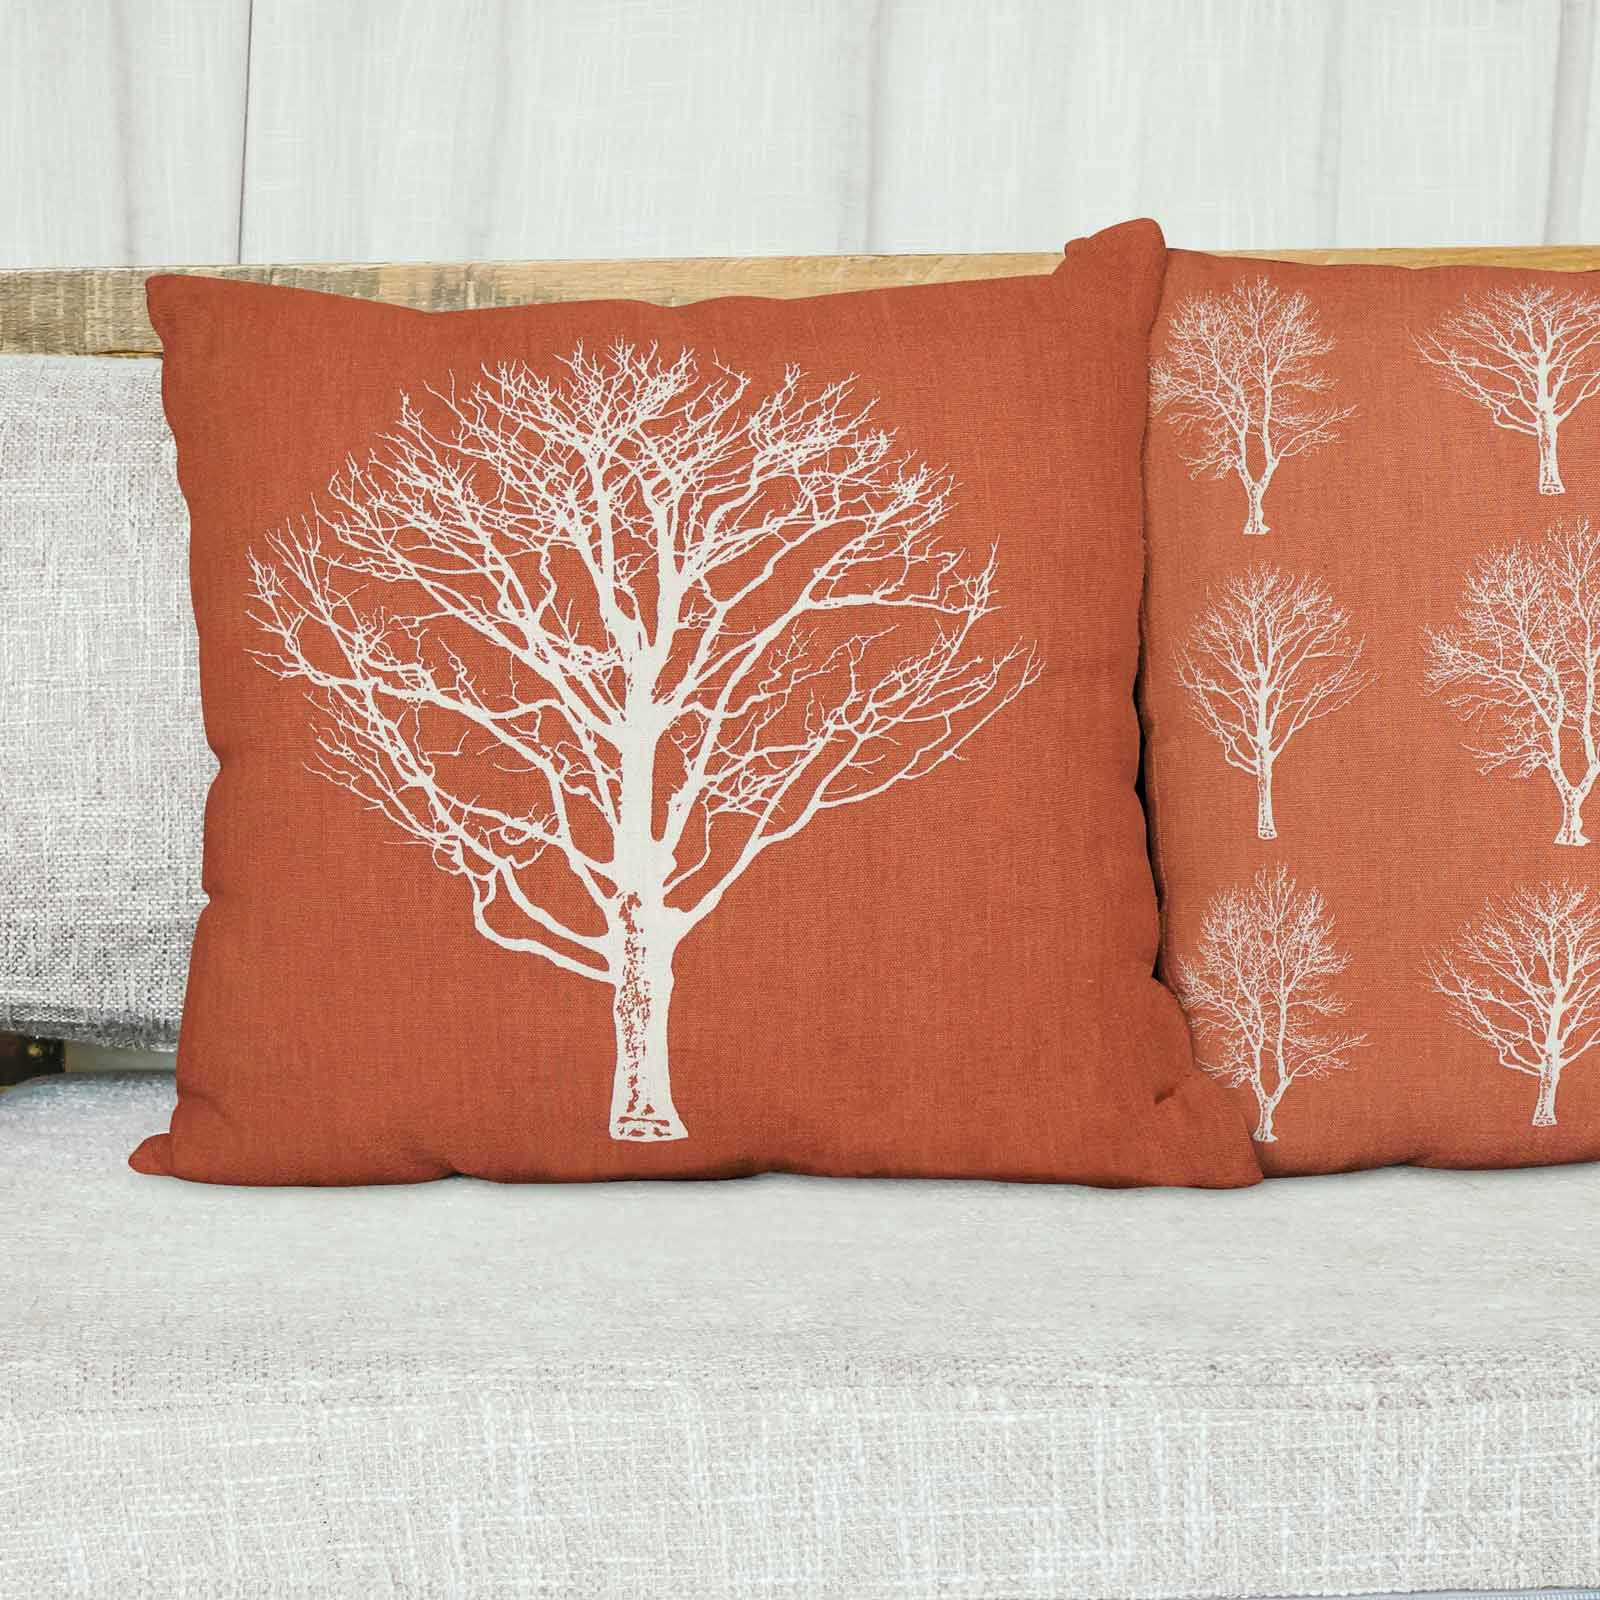 Woodland-Trees-Cushion-Cover-Modern-Reversible-Tree-Print-Covers-17-034-x-17-034 thumbnail 15